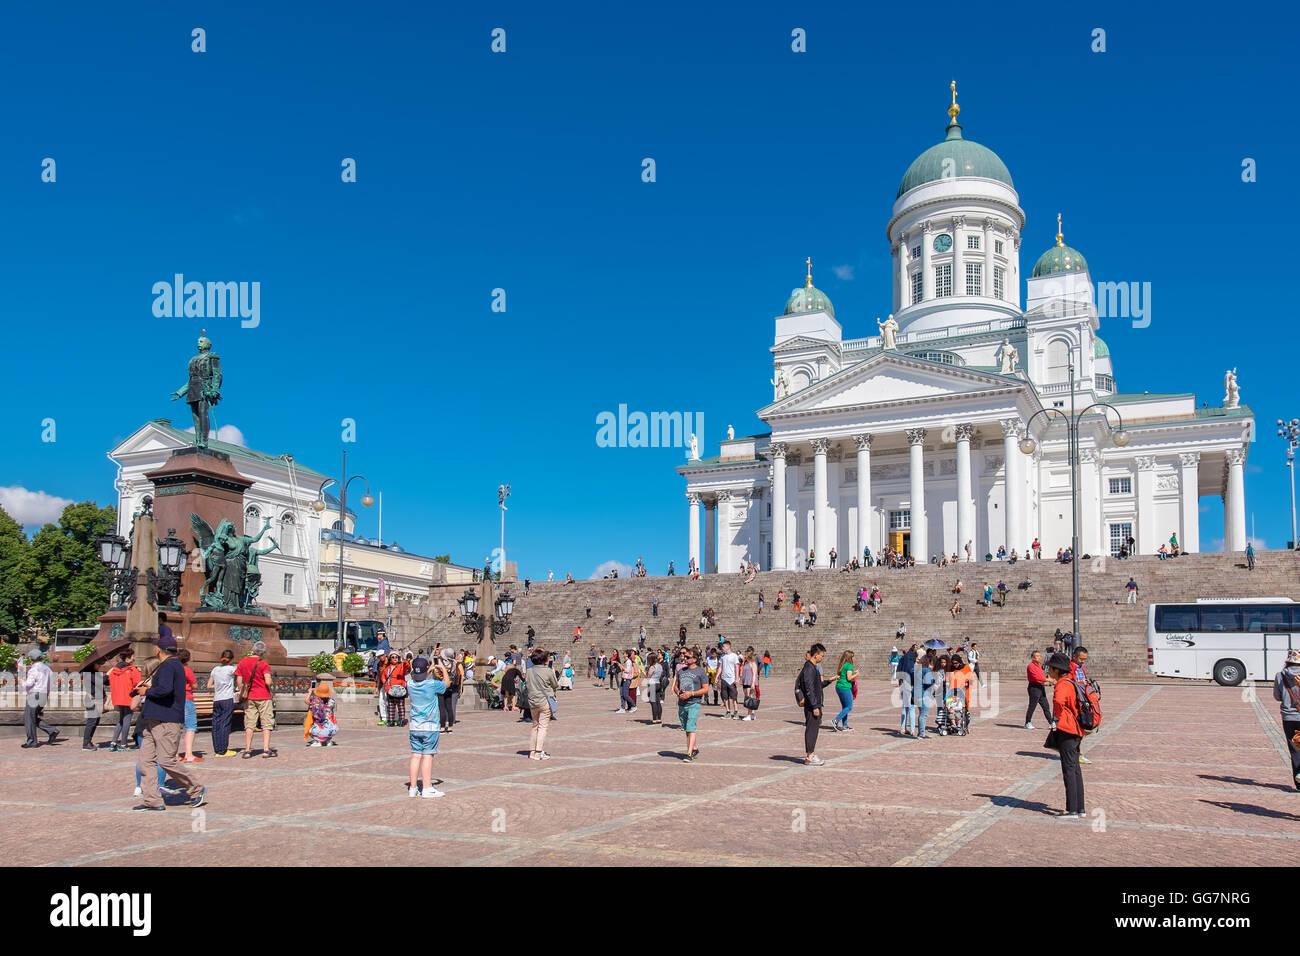 Senate Square. Helsinki, Finland - Stock Image